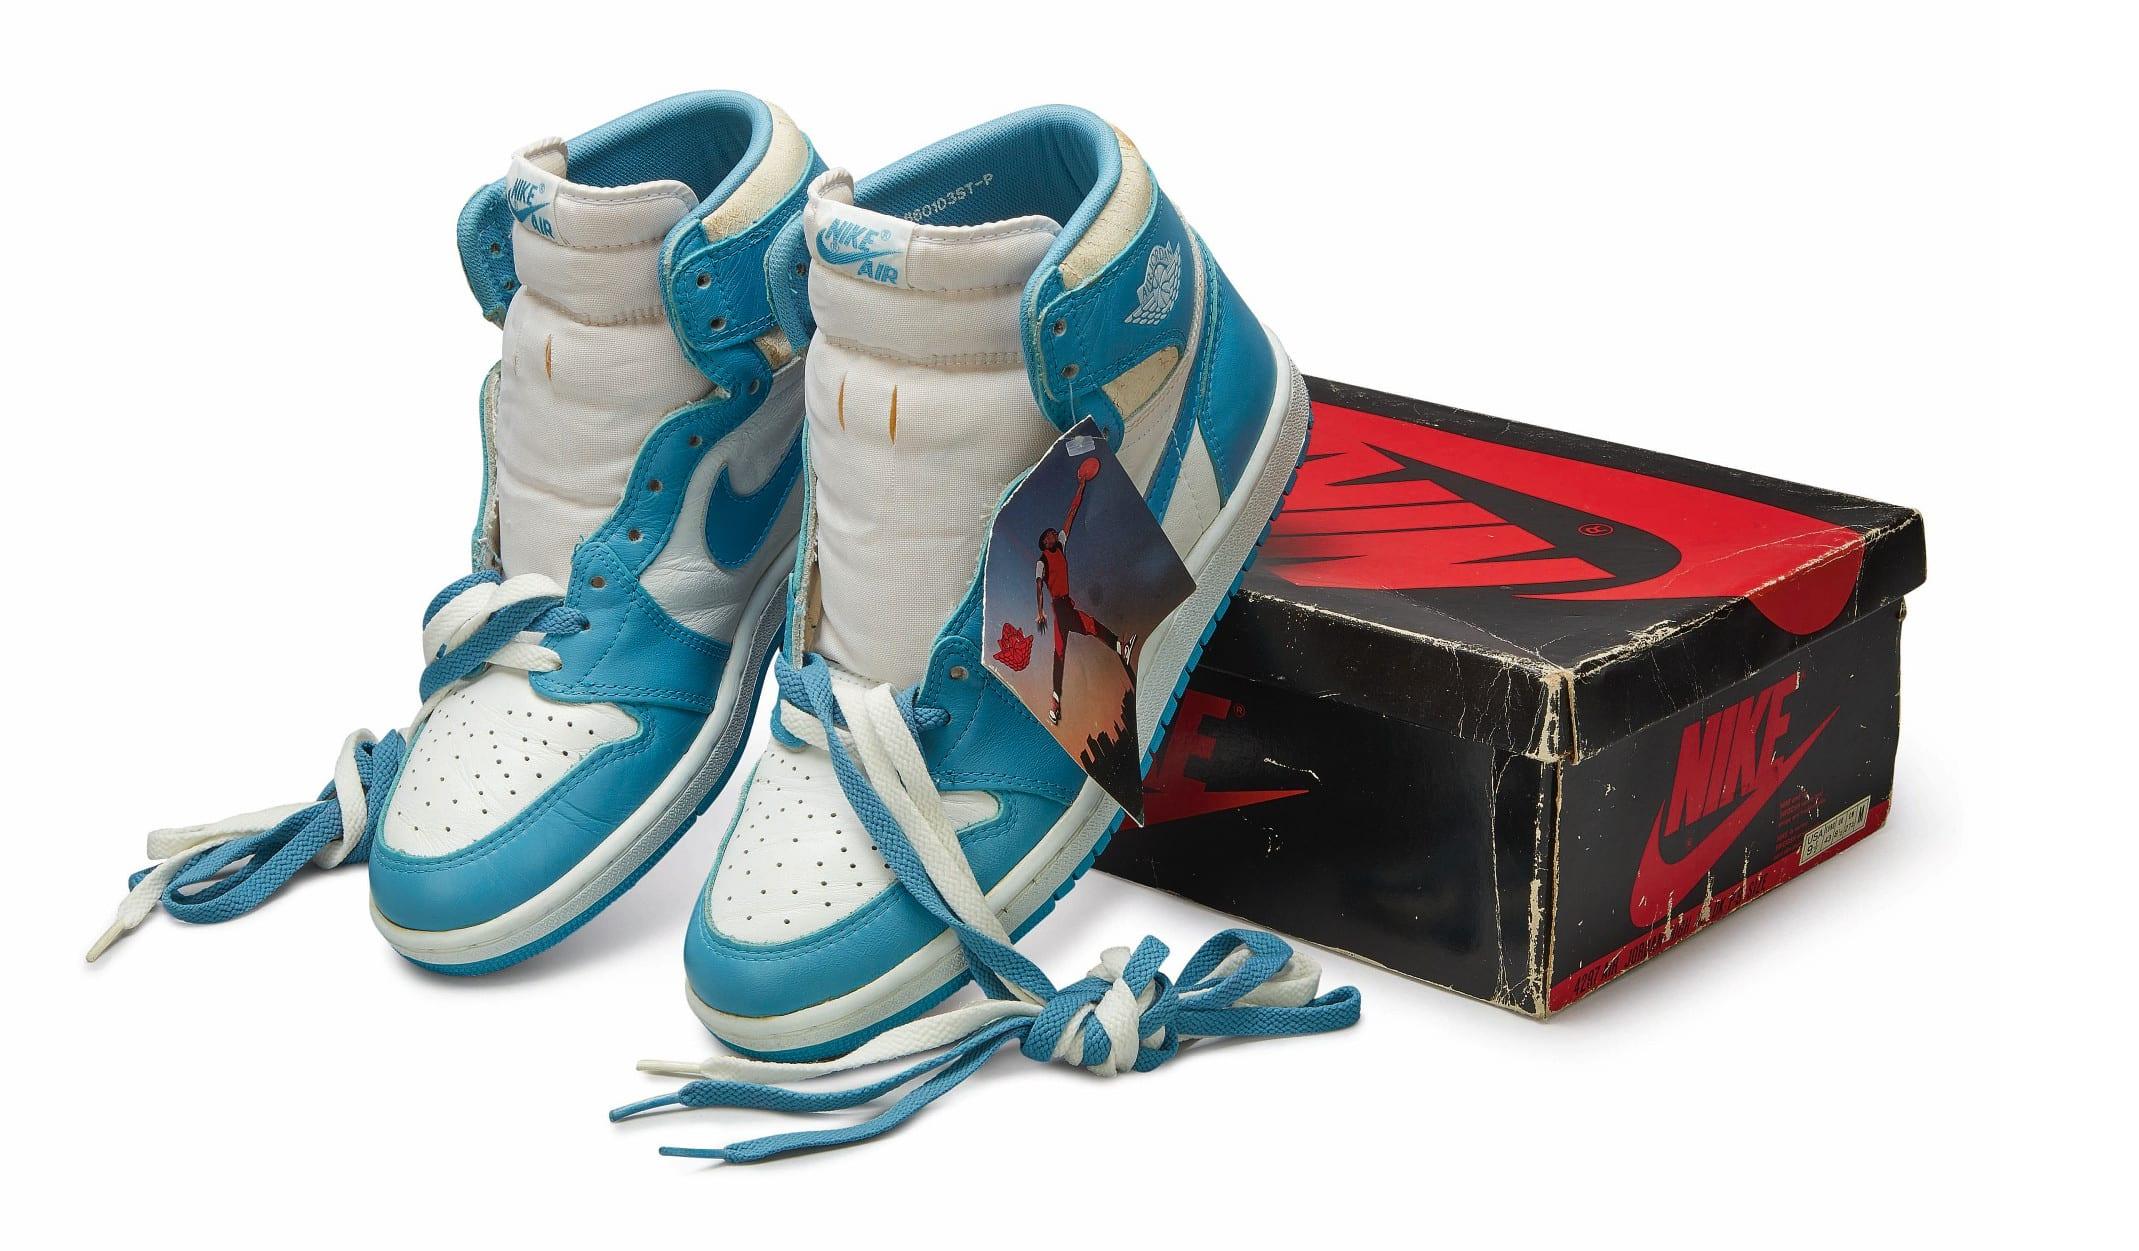 Nike Air Jordan 1 High OG (1985) 'Carolina Blue', Foto: Sotheby's